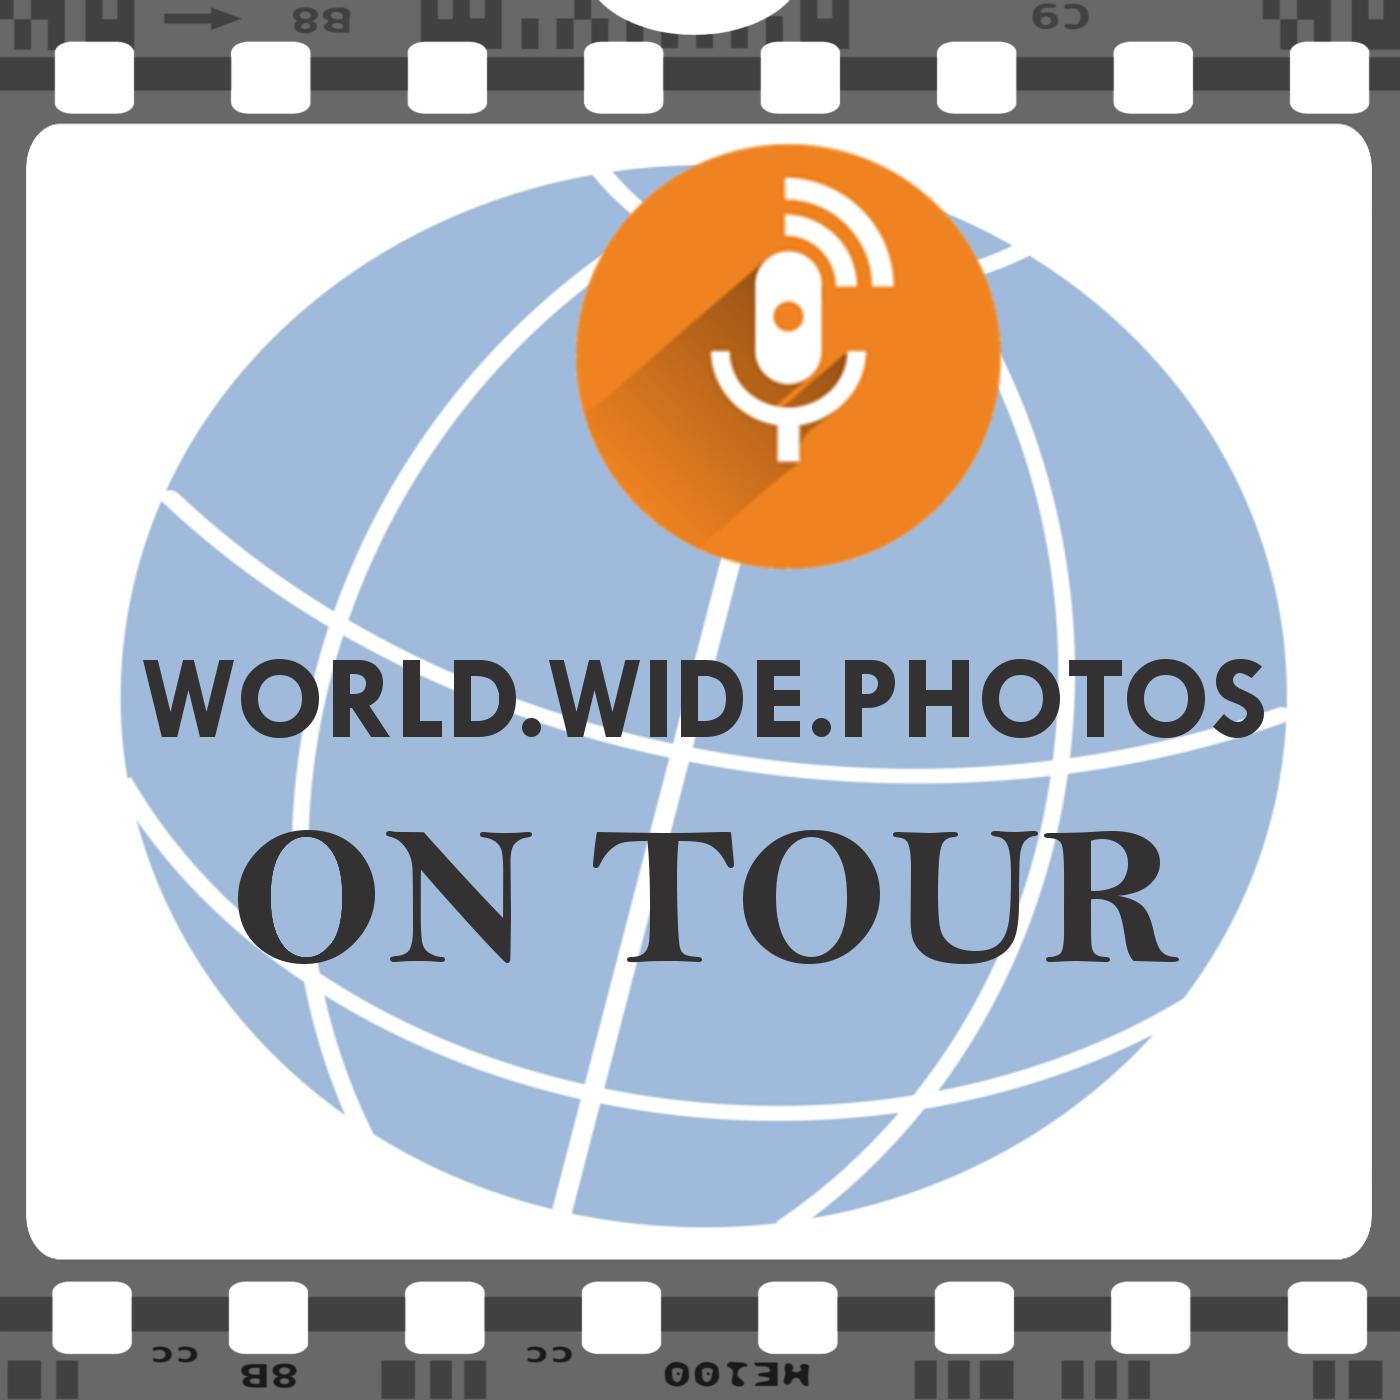 WORLD.WIDE.PHOTOS ON TOUR